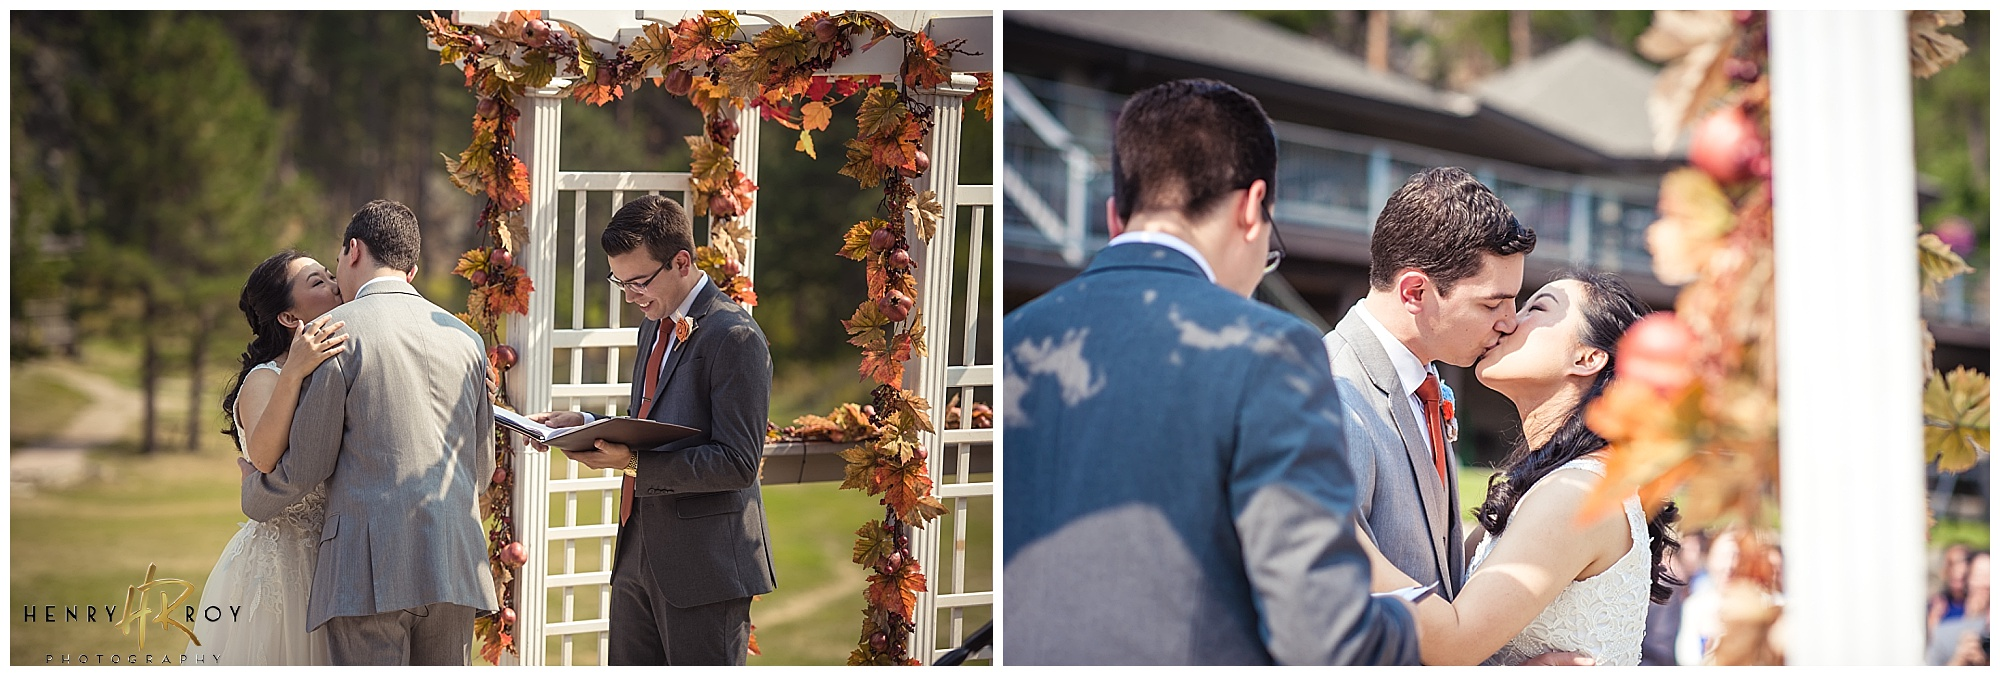 Rapid City Wedding Photographer0014.jpg